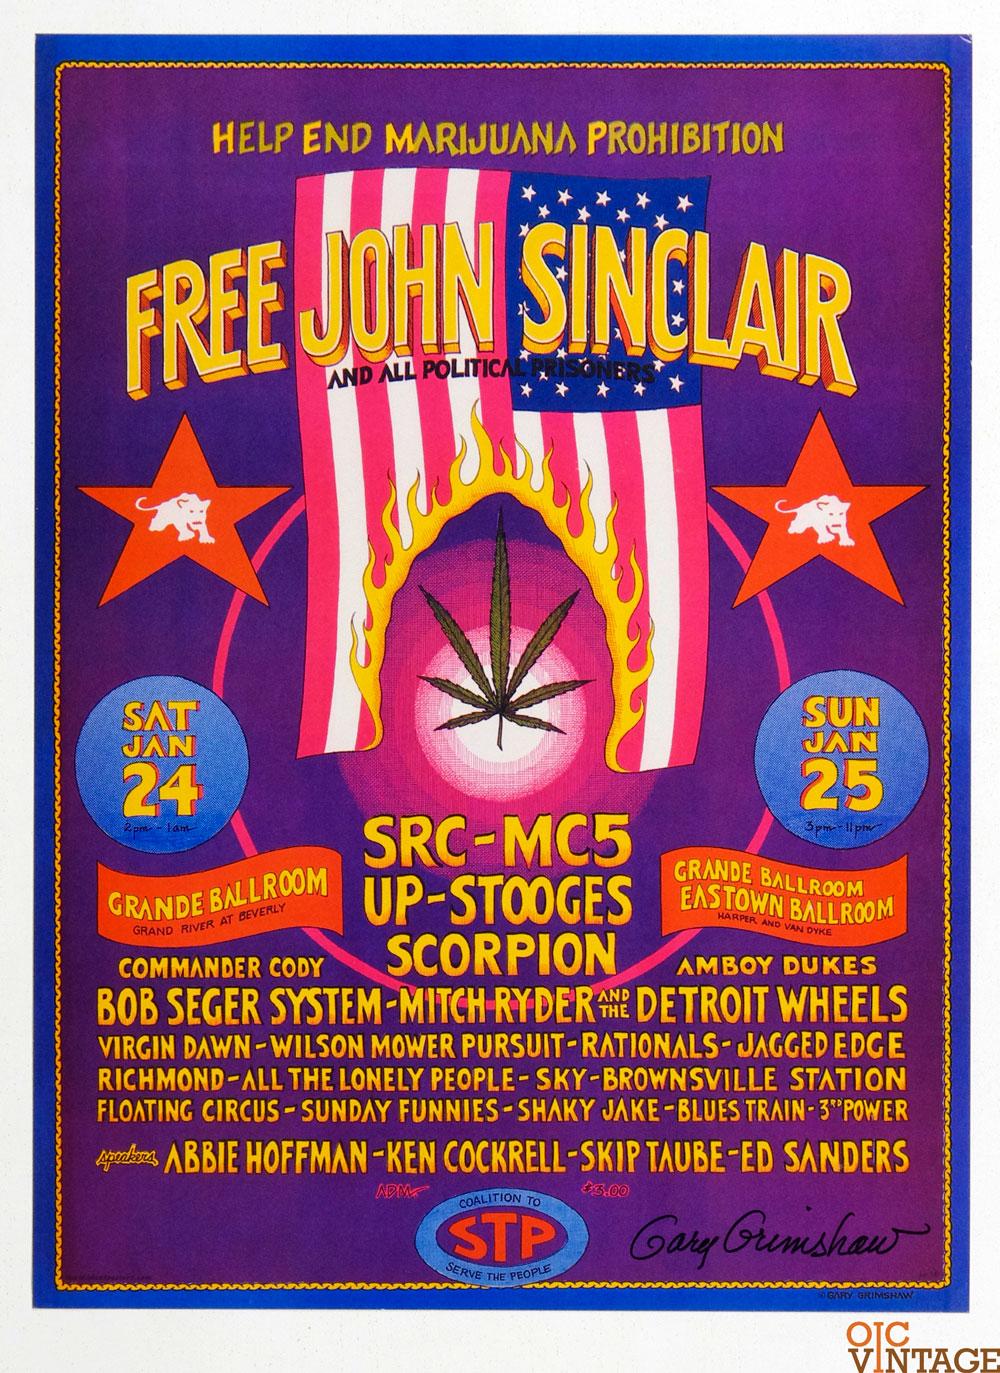 Grande Ballroom Poster 1970 Jan 24 Free John Sinclaire MC5 Gary Grimshaw signed